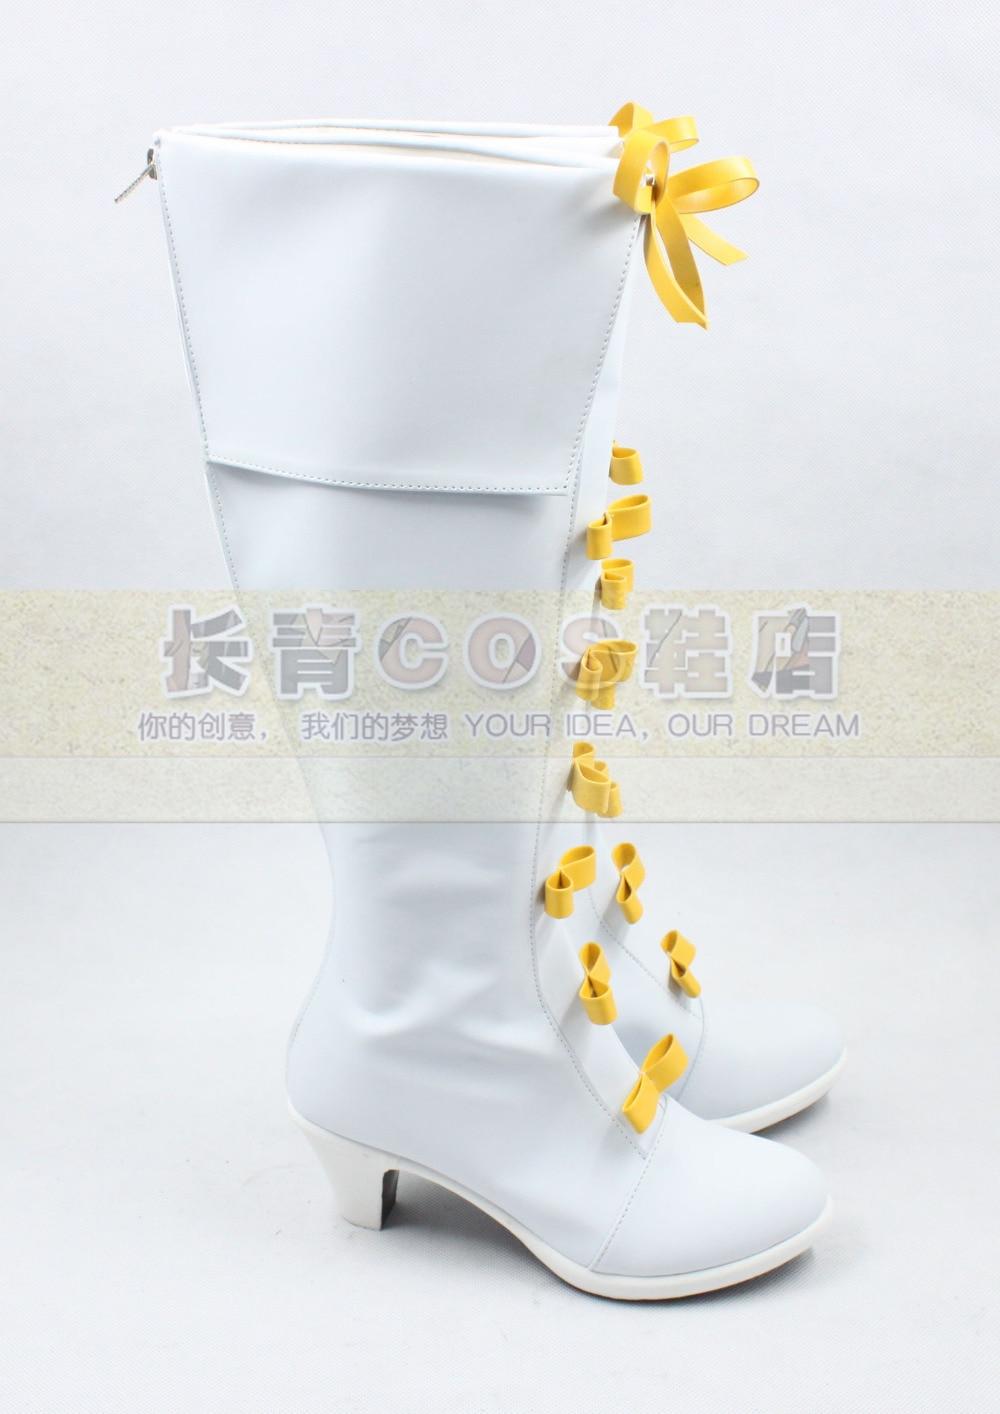 The Legend of Heroes Sora no Kiseki Elie MacDowell White Girls Long Cosplay Shoes Boots C006